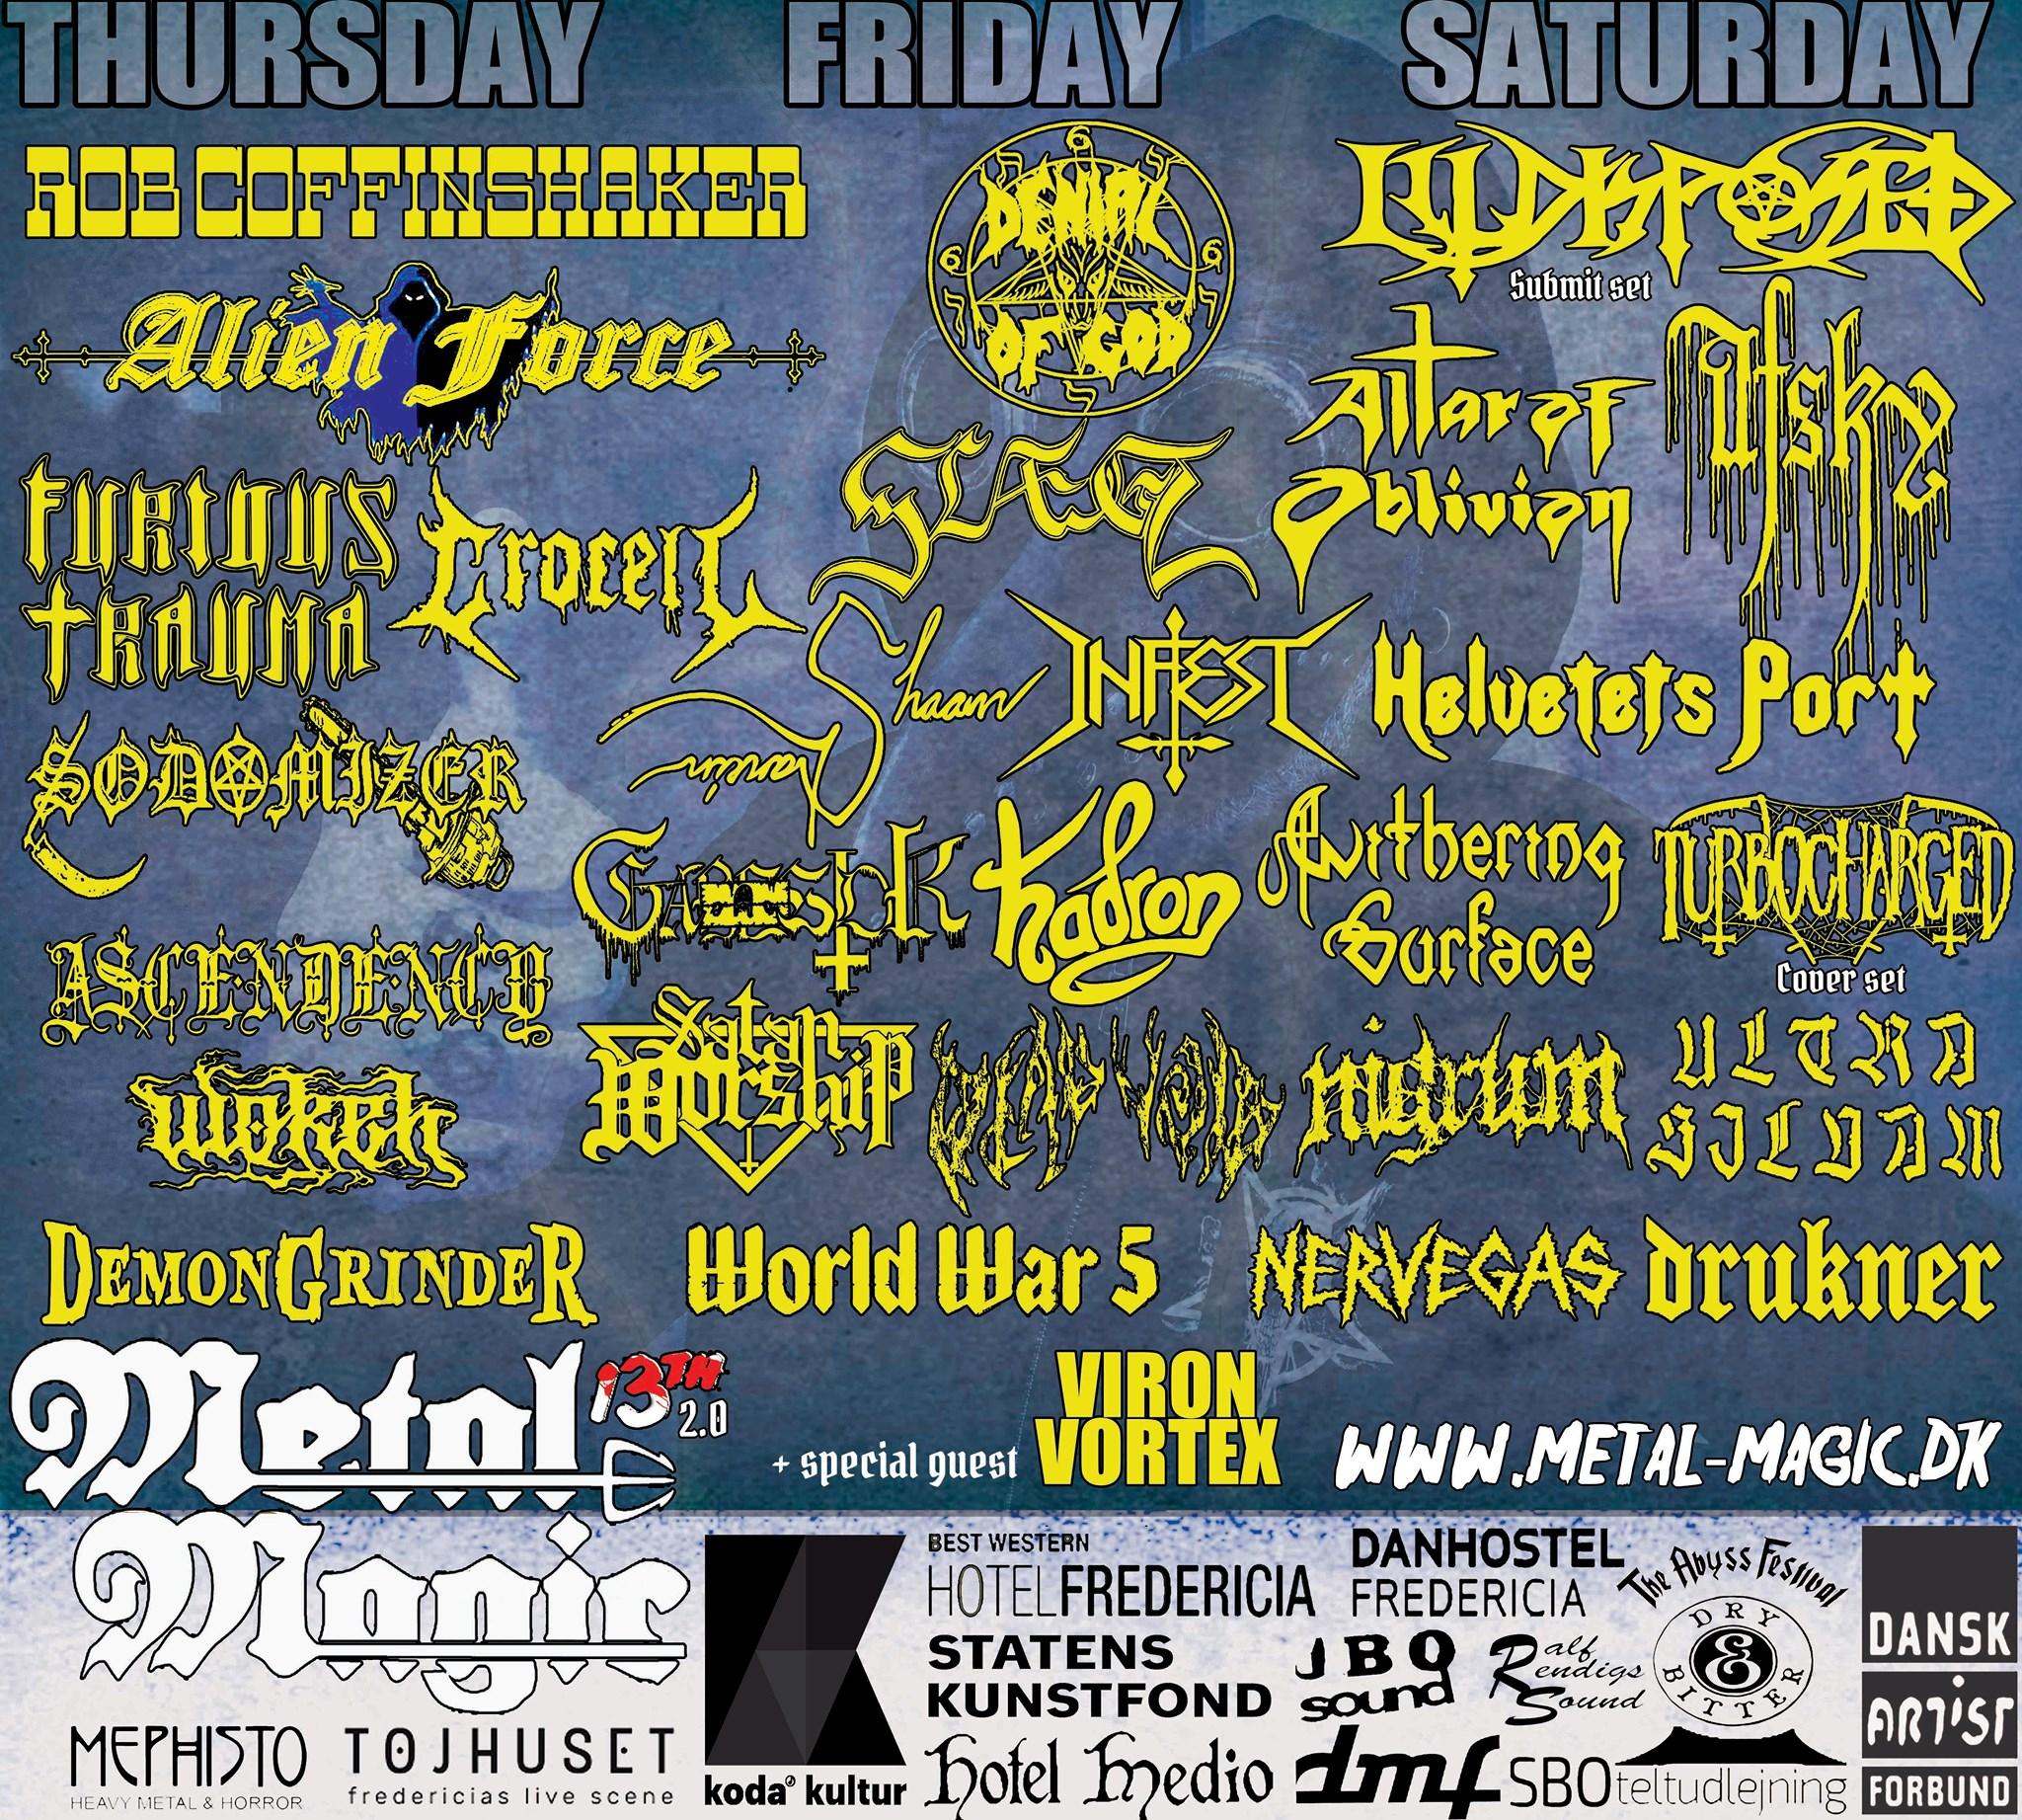 2021 running order schedule metal magic festival denmark